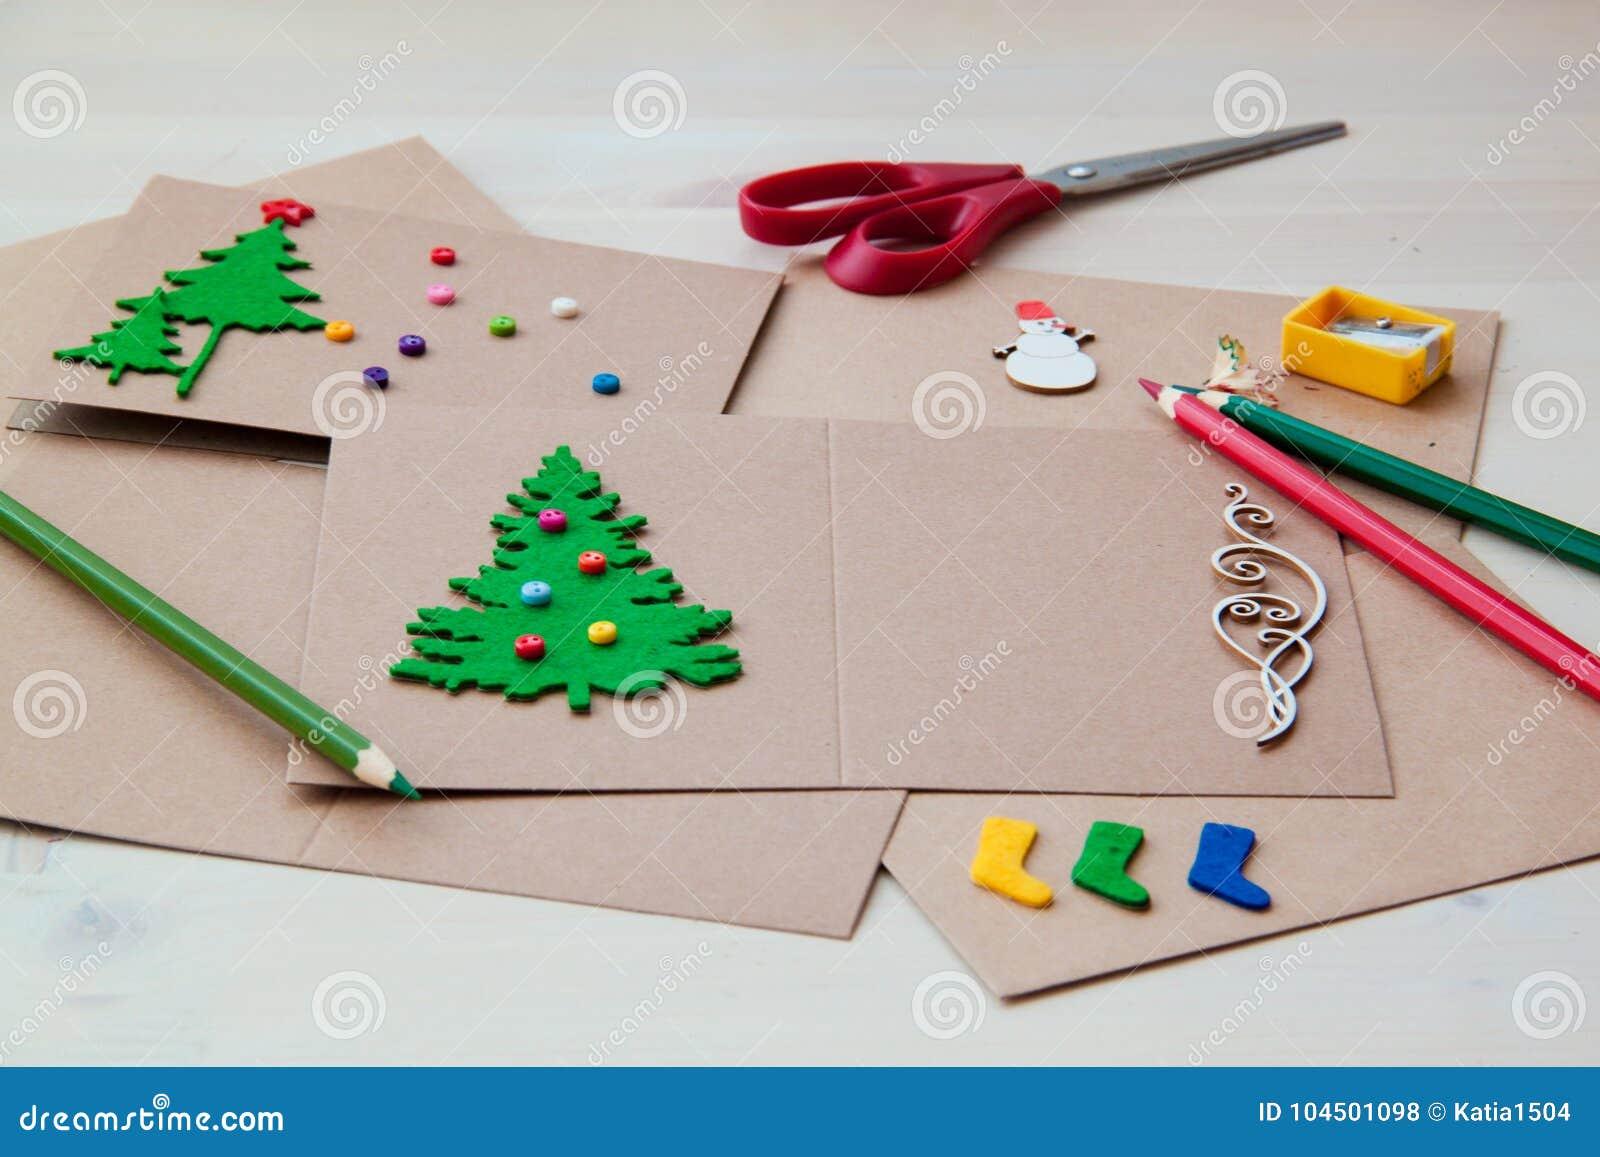 Signing Handmade Christmas Cards. Felt, Scissors, Buttons, Christmas ...